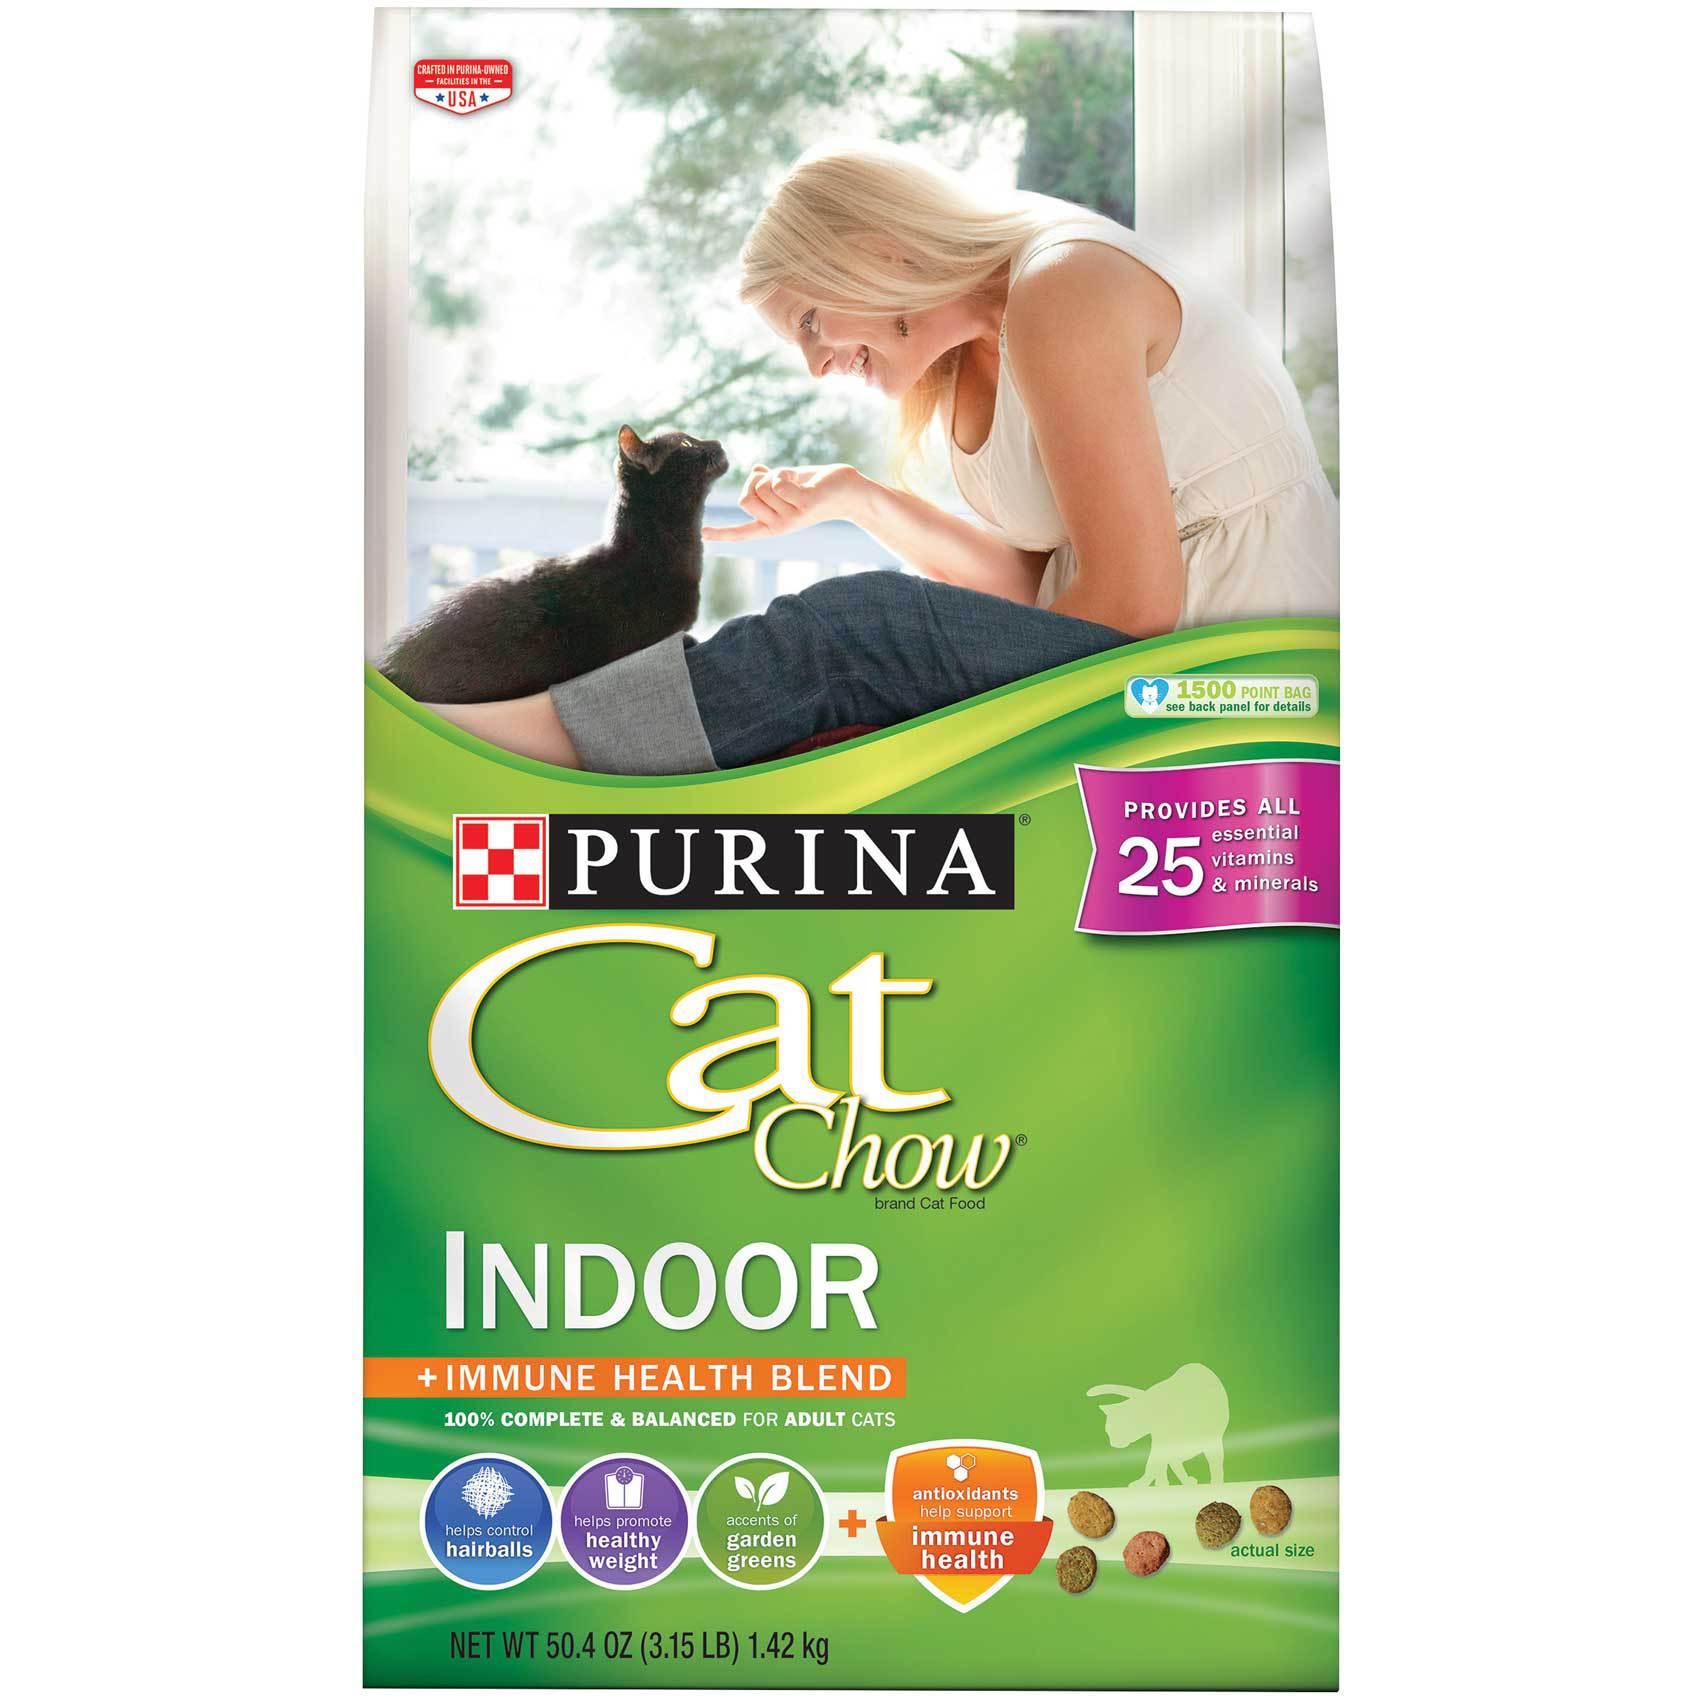 PURINA CAT CHOW INDOOR 1.42KG